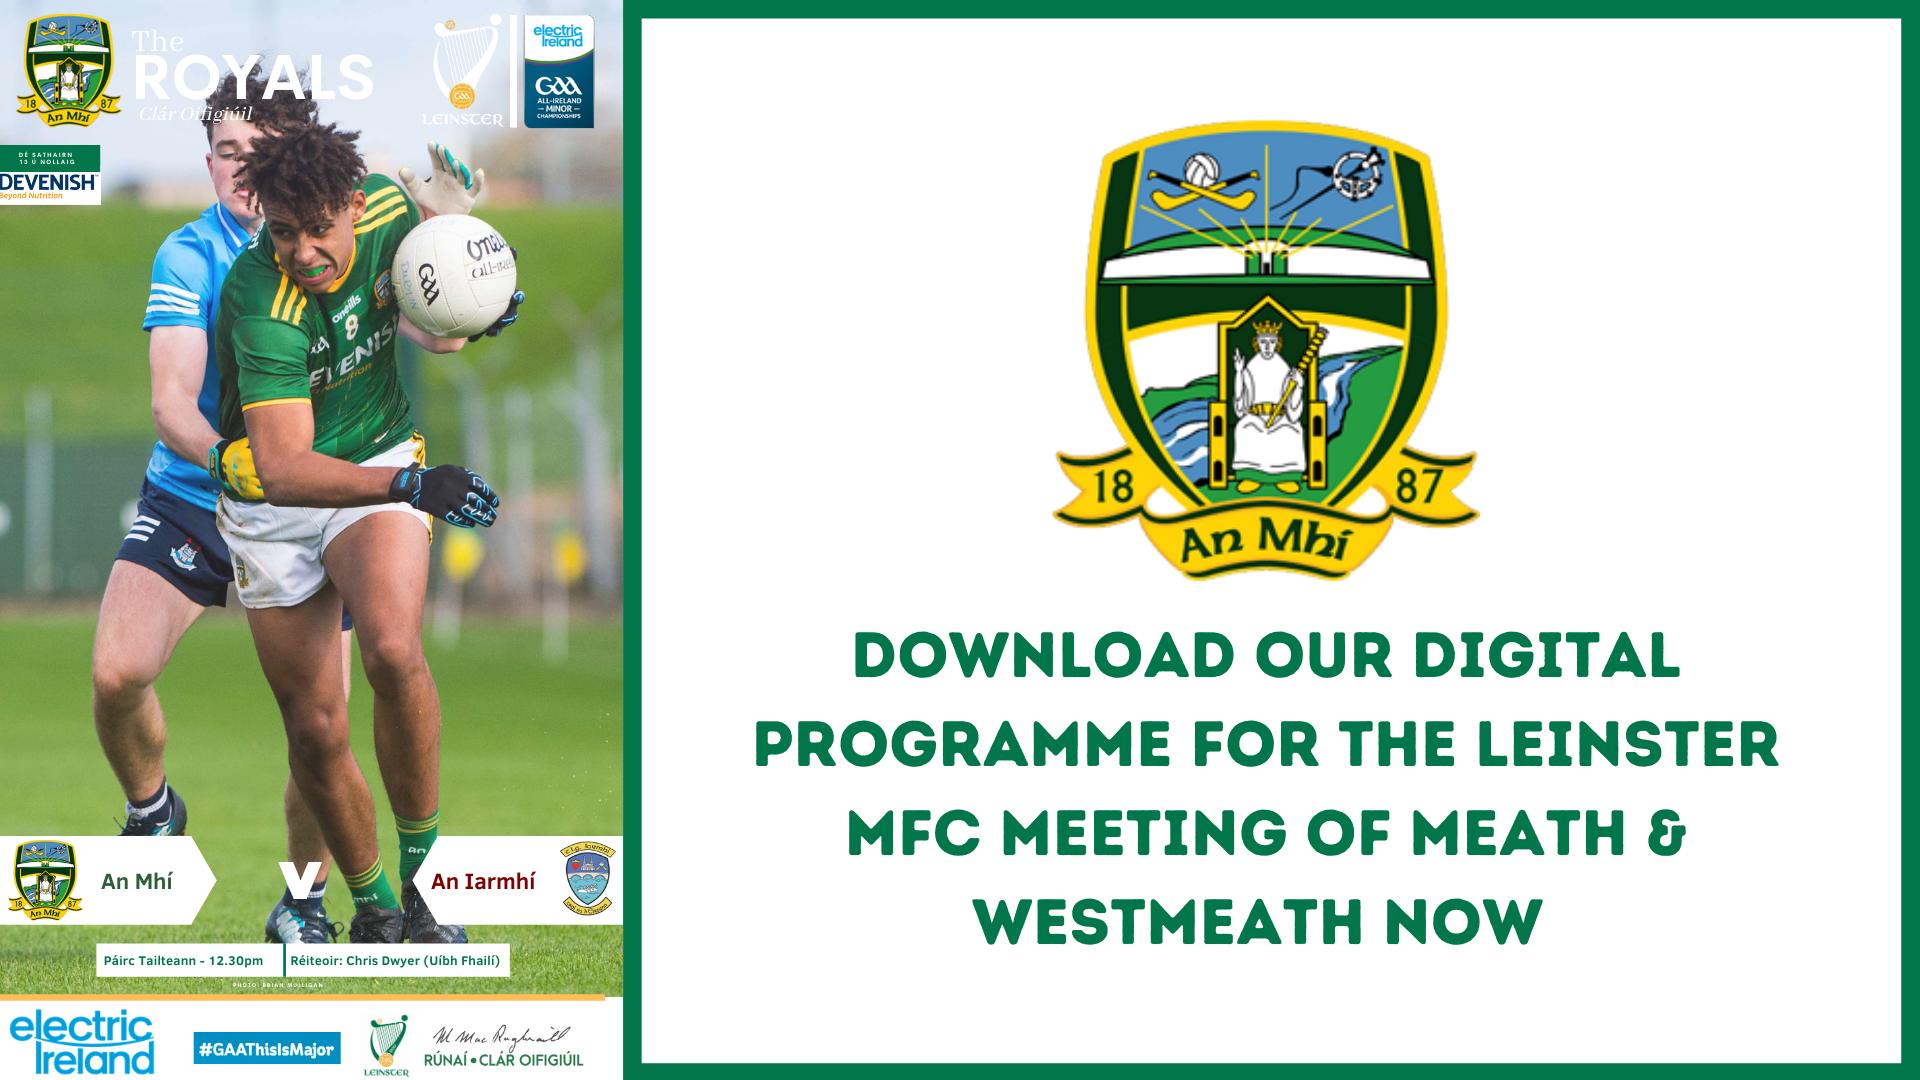 Get you Leinster MFC digital programme now